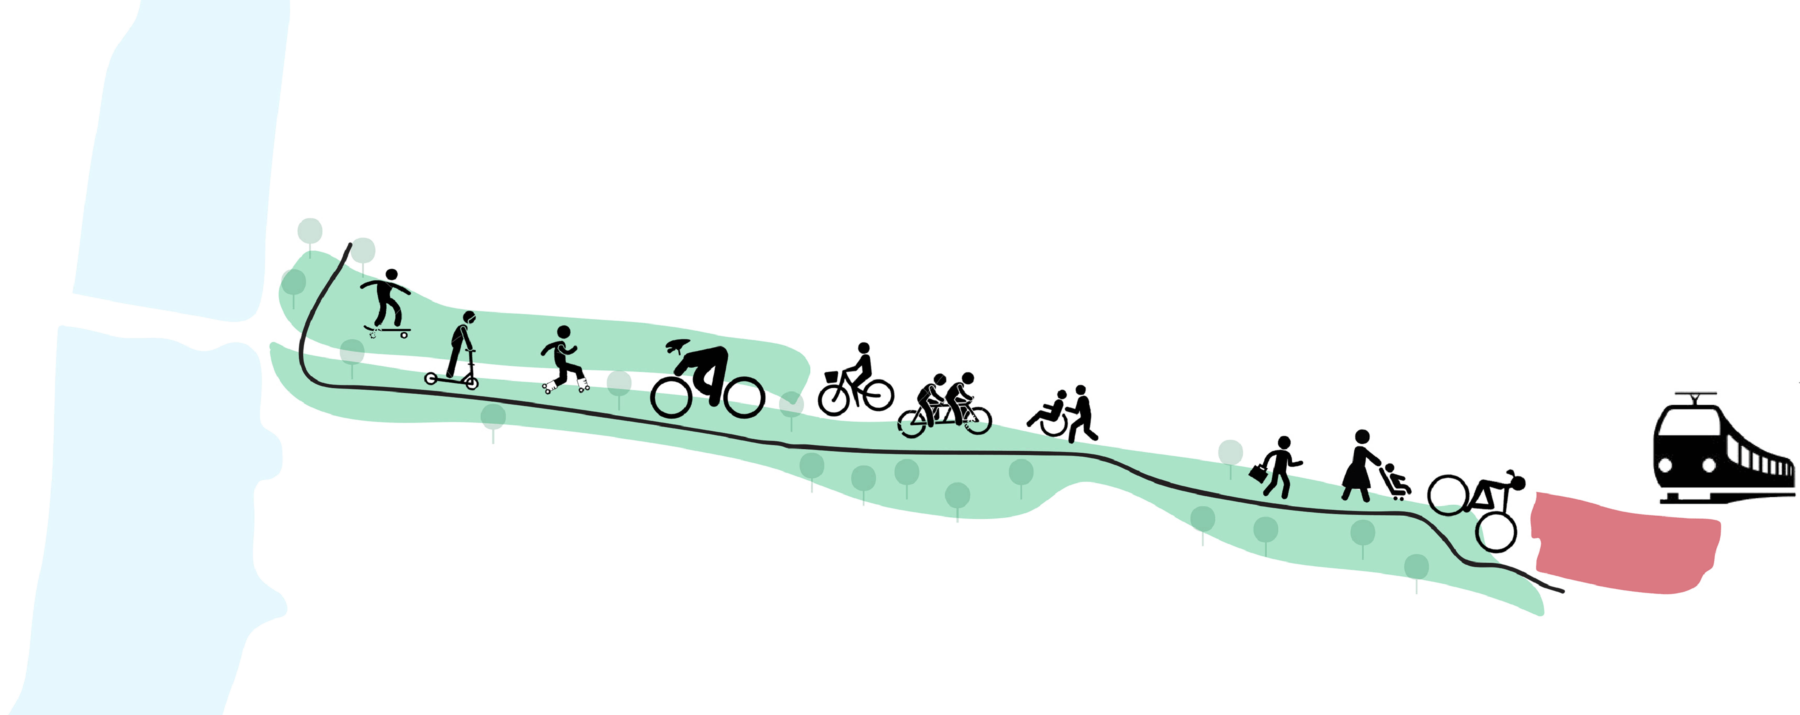 Sarah-Wigglesworth-Architects Kingston-Mini-Holland Context River-Link 3600